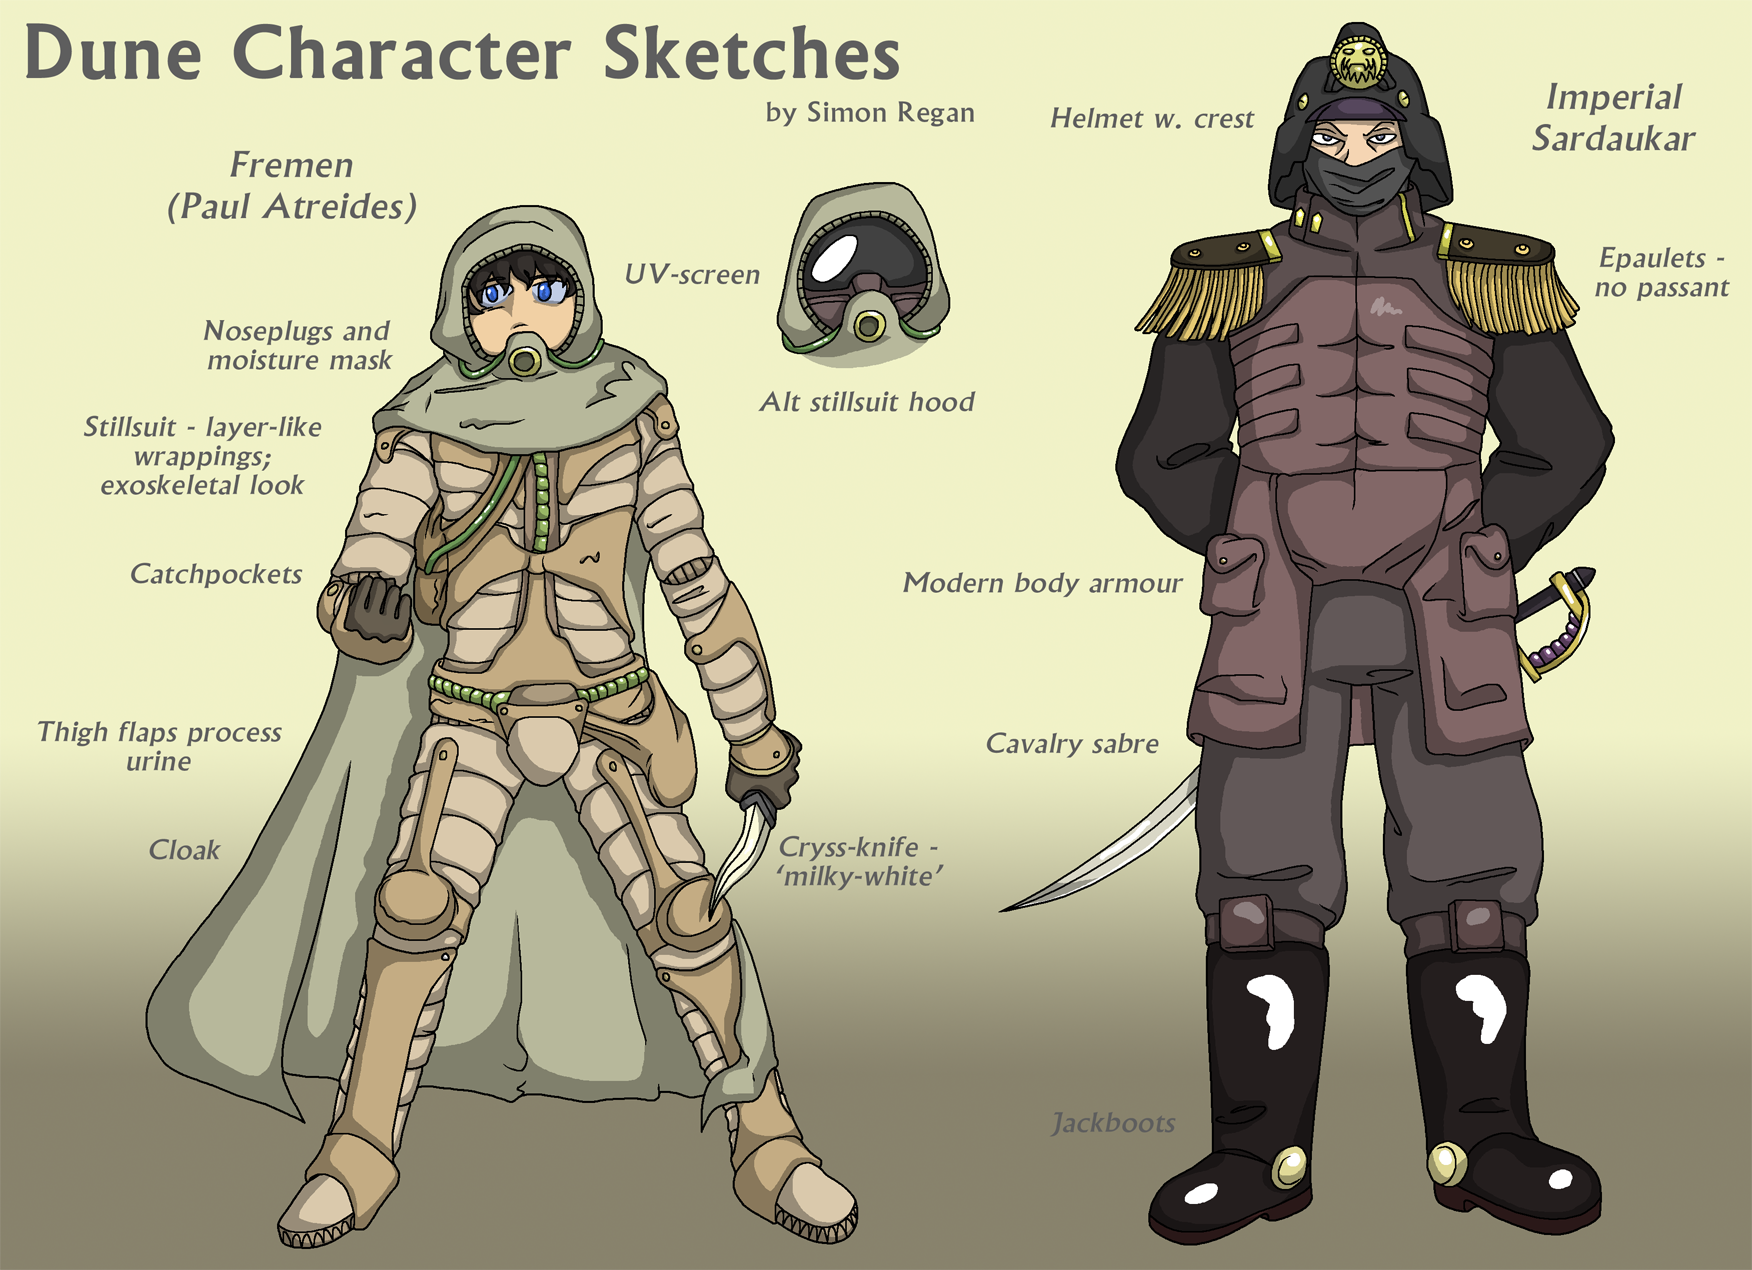 Character Design Book 2015 : Dune character art fremen and imperial sardaukar by